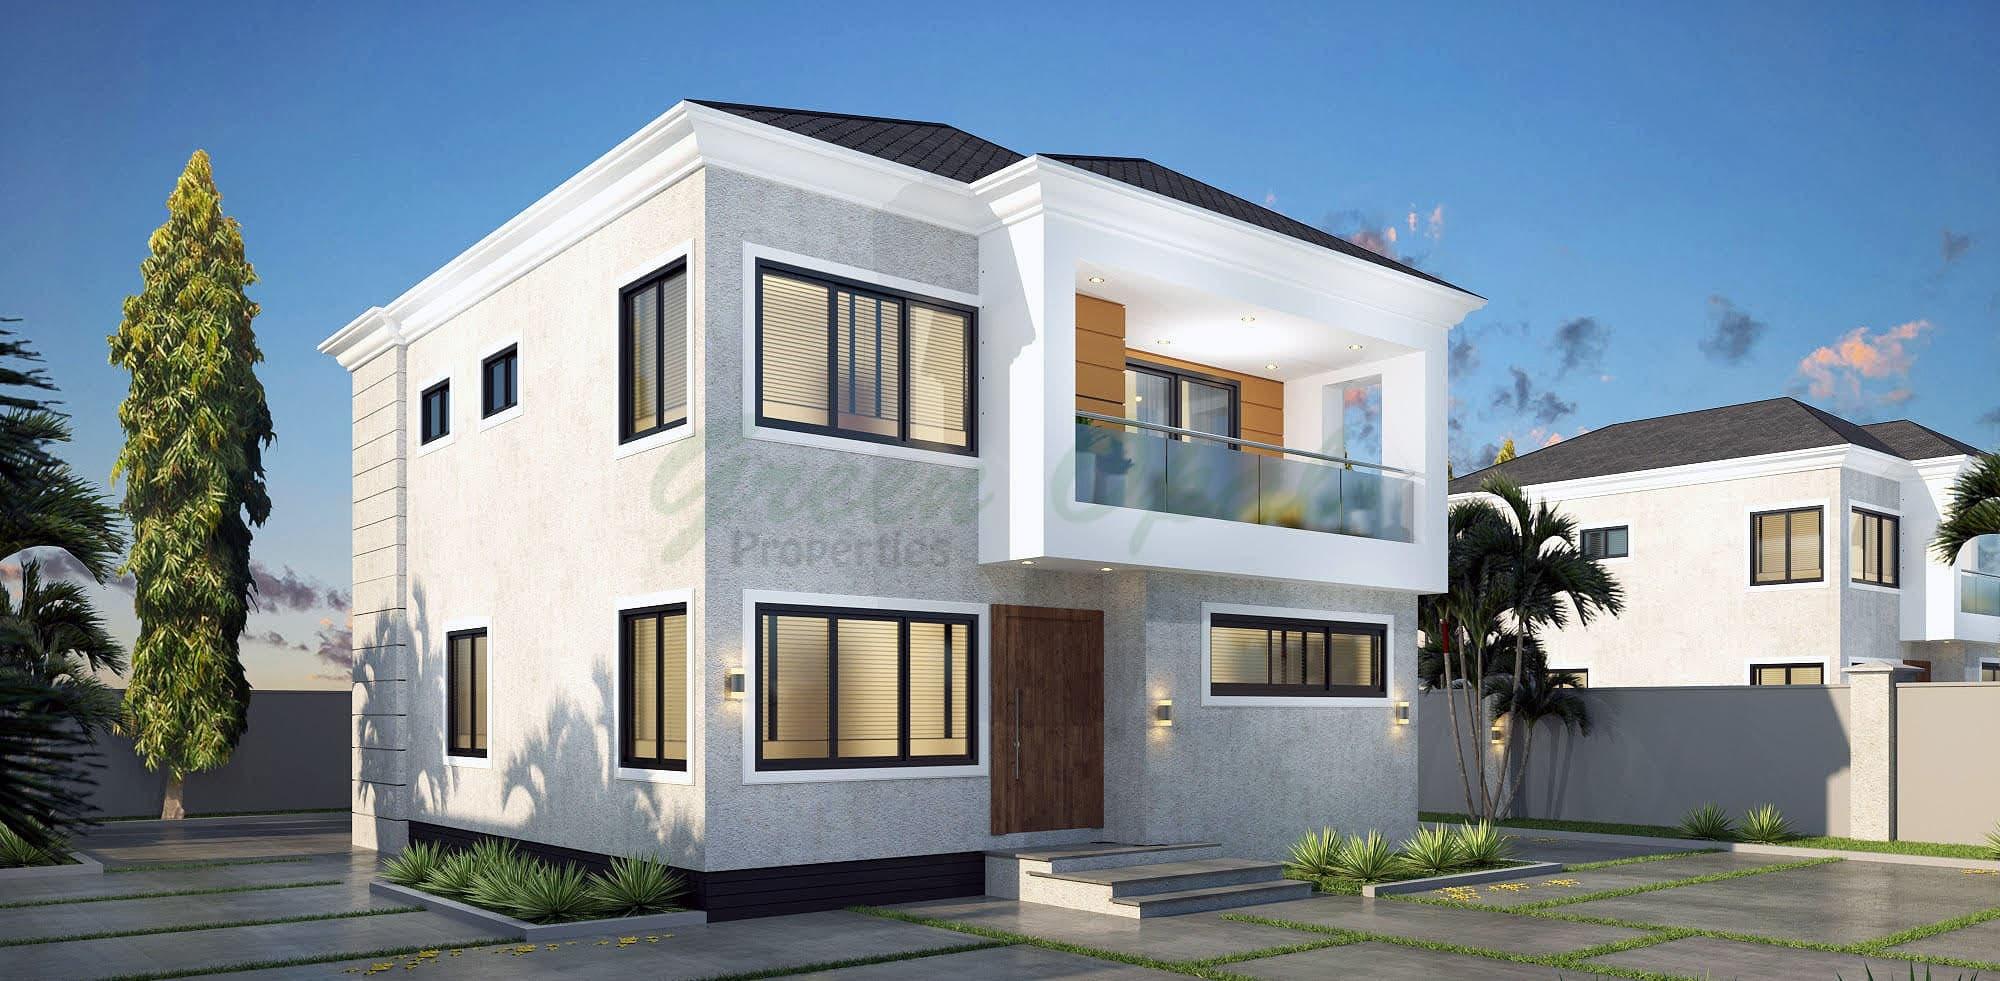 Green Opal Ghana 3 bedroom house